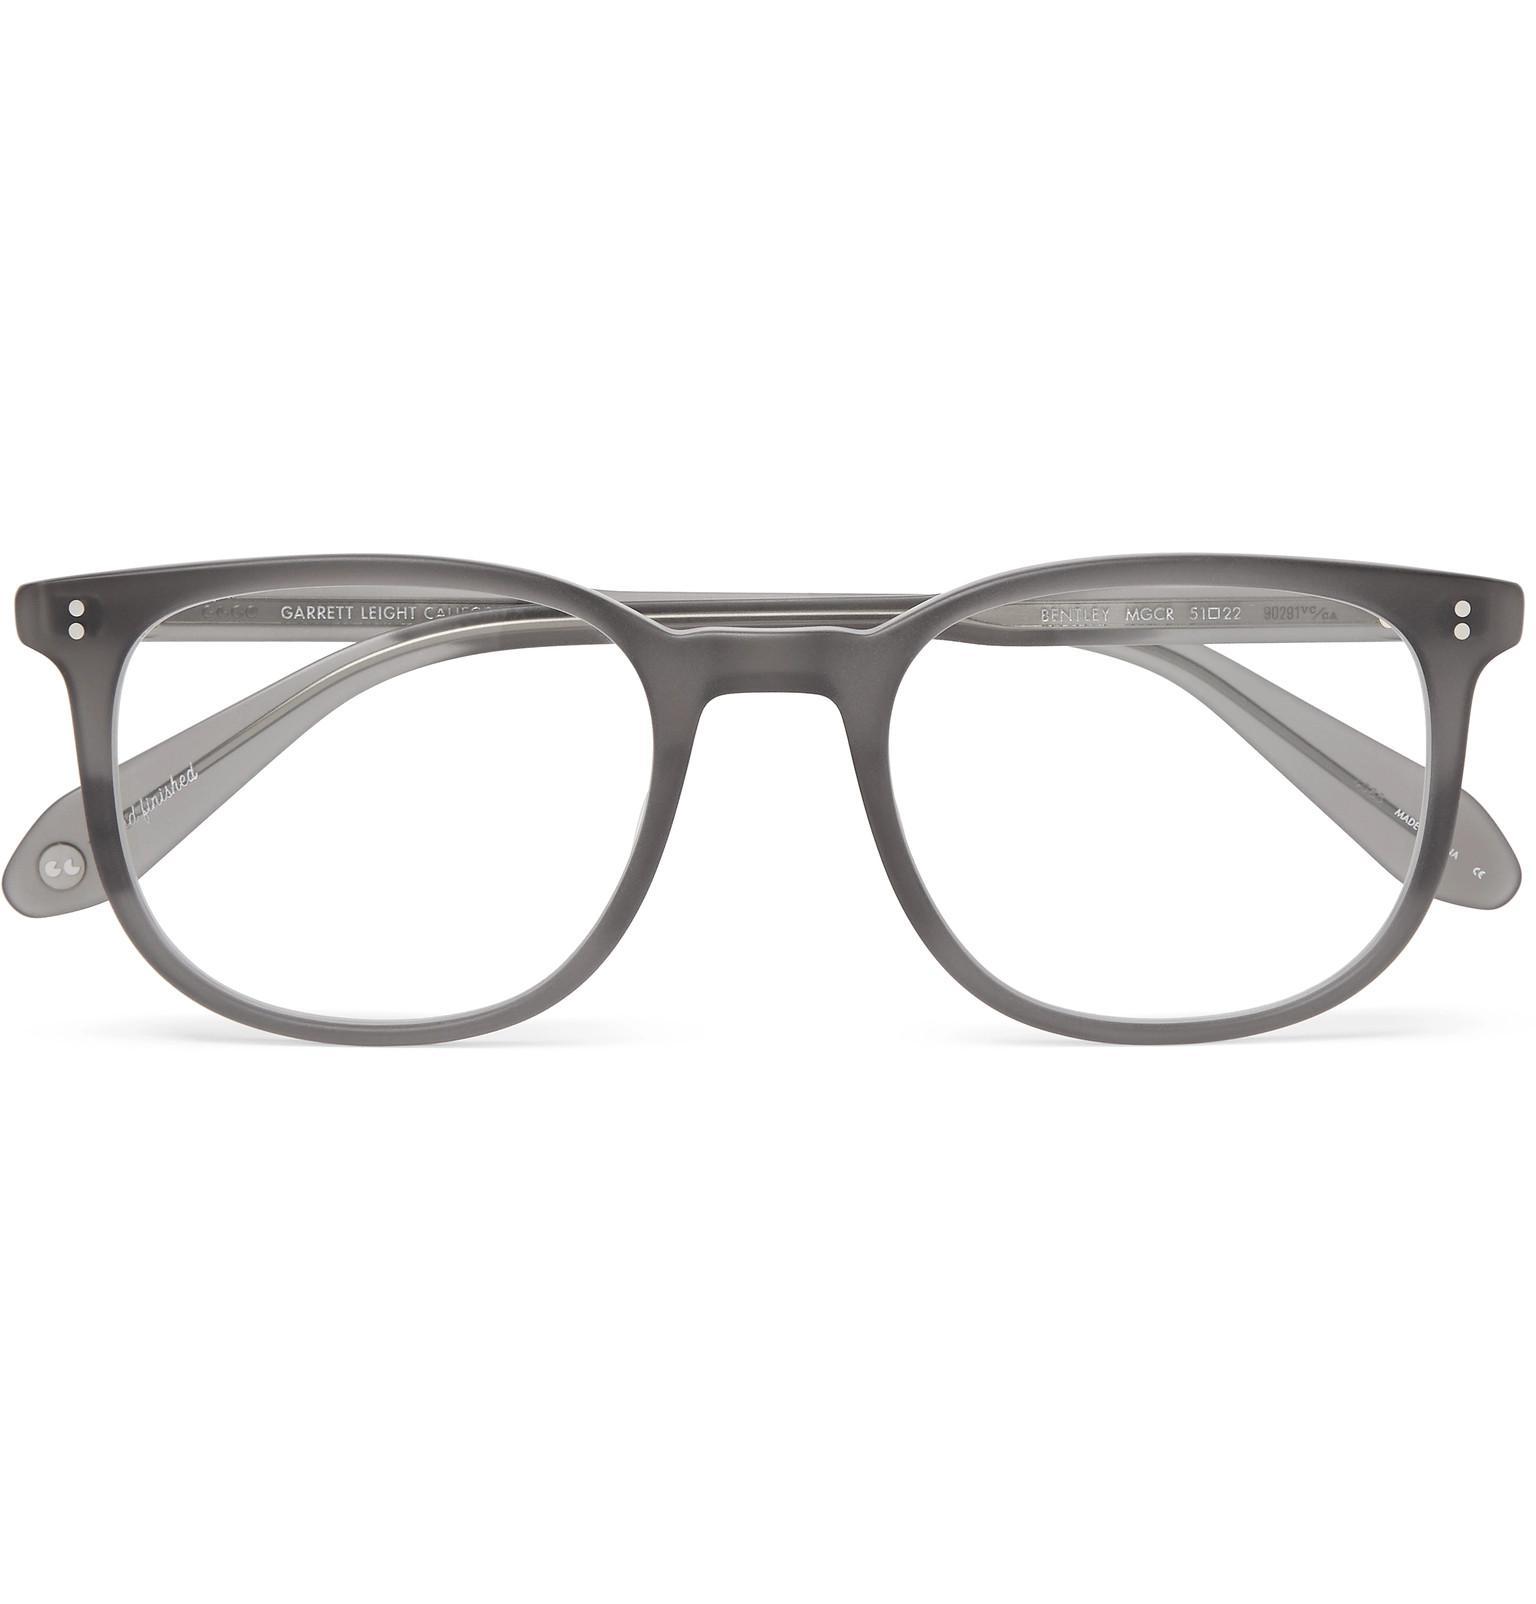 d7d504629b48 ... Gray Bentley 51 Square-frame Matte-acetate Optical Glasses for Men.  View fullscreen